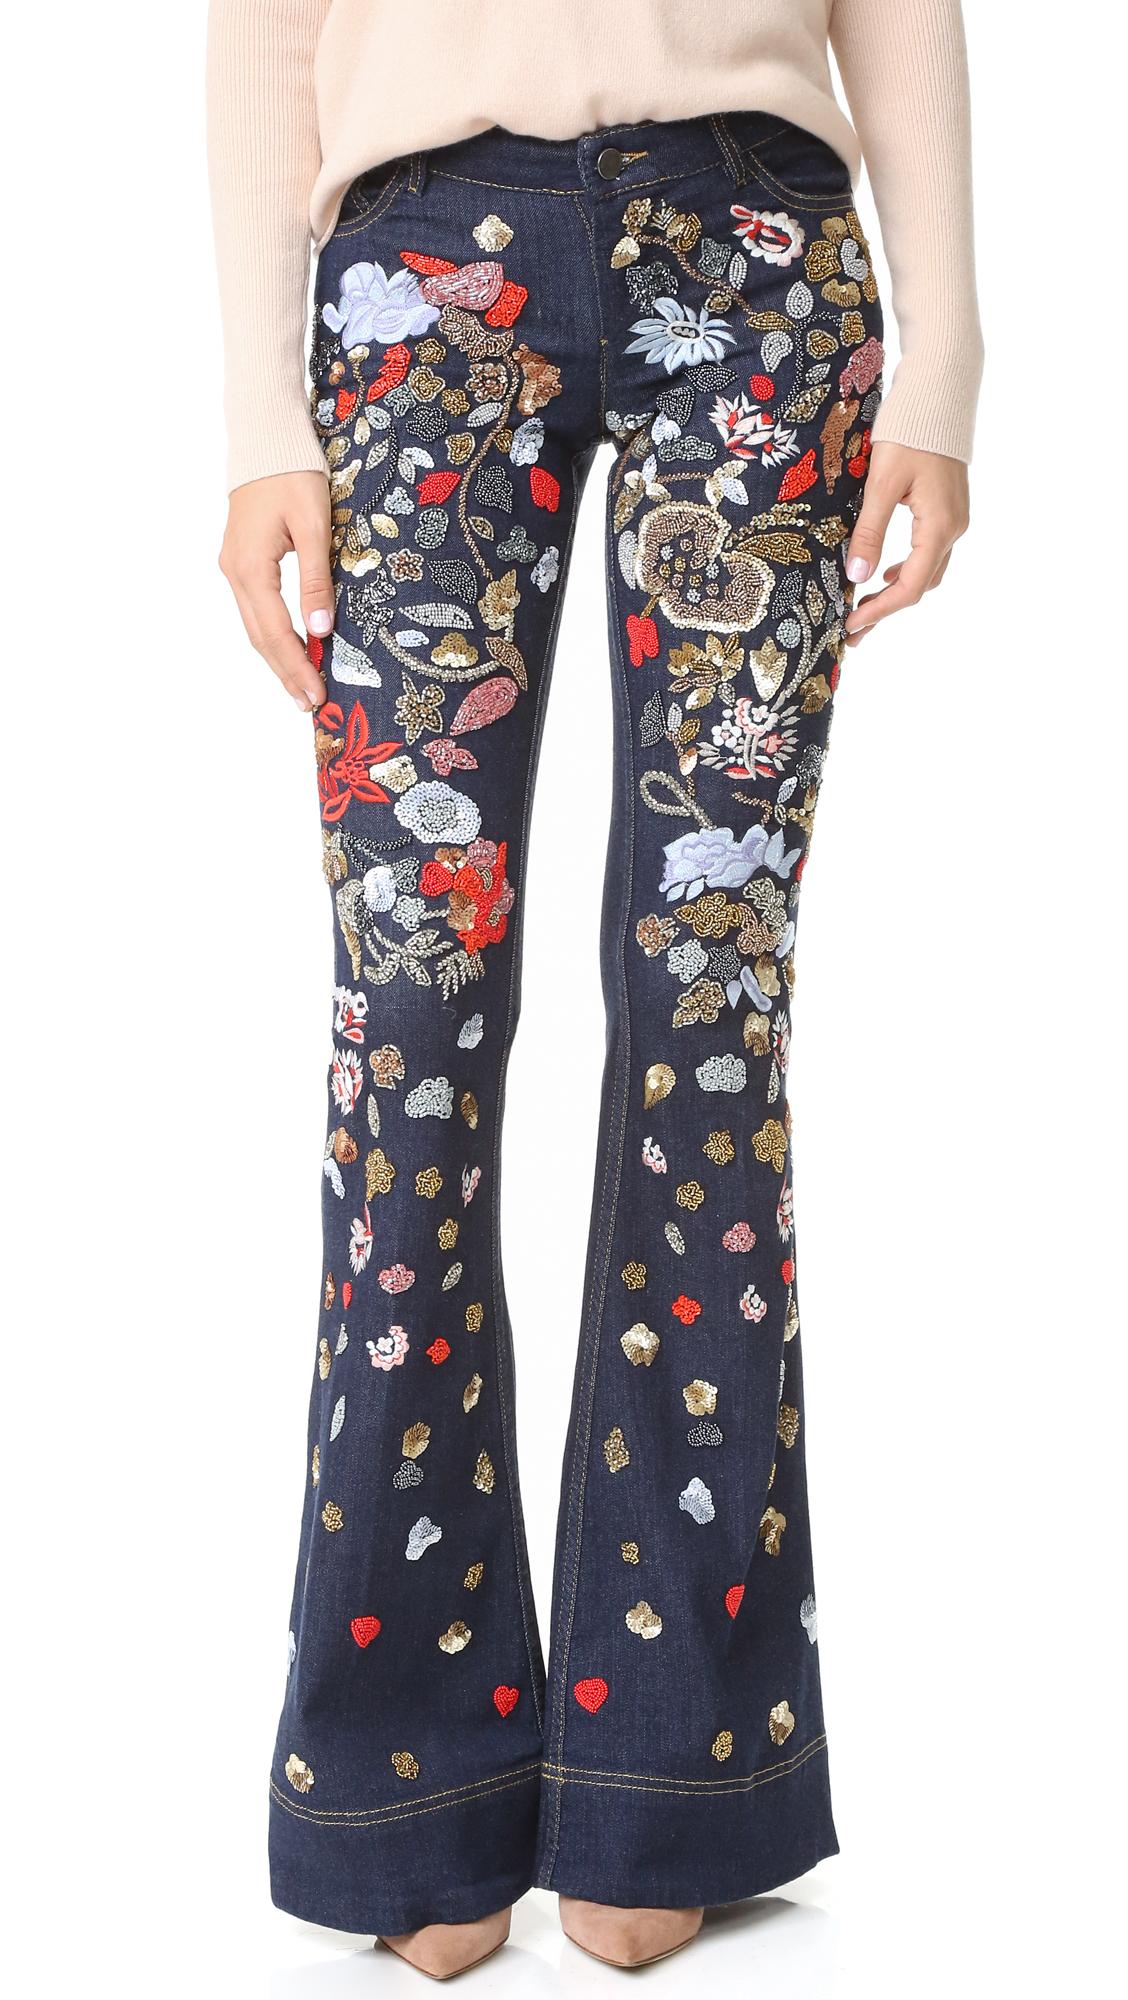 Alice + Olivia Ryley Embellished Low Rise Bell Jeans - Dark Indigo/Multi at Shopbop